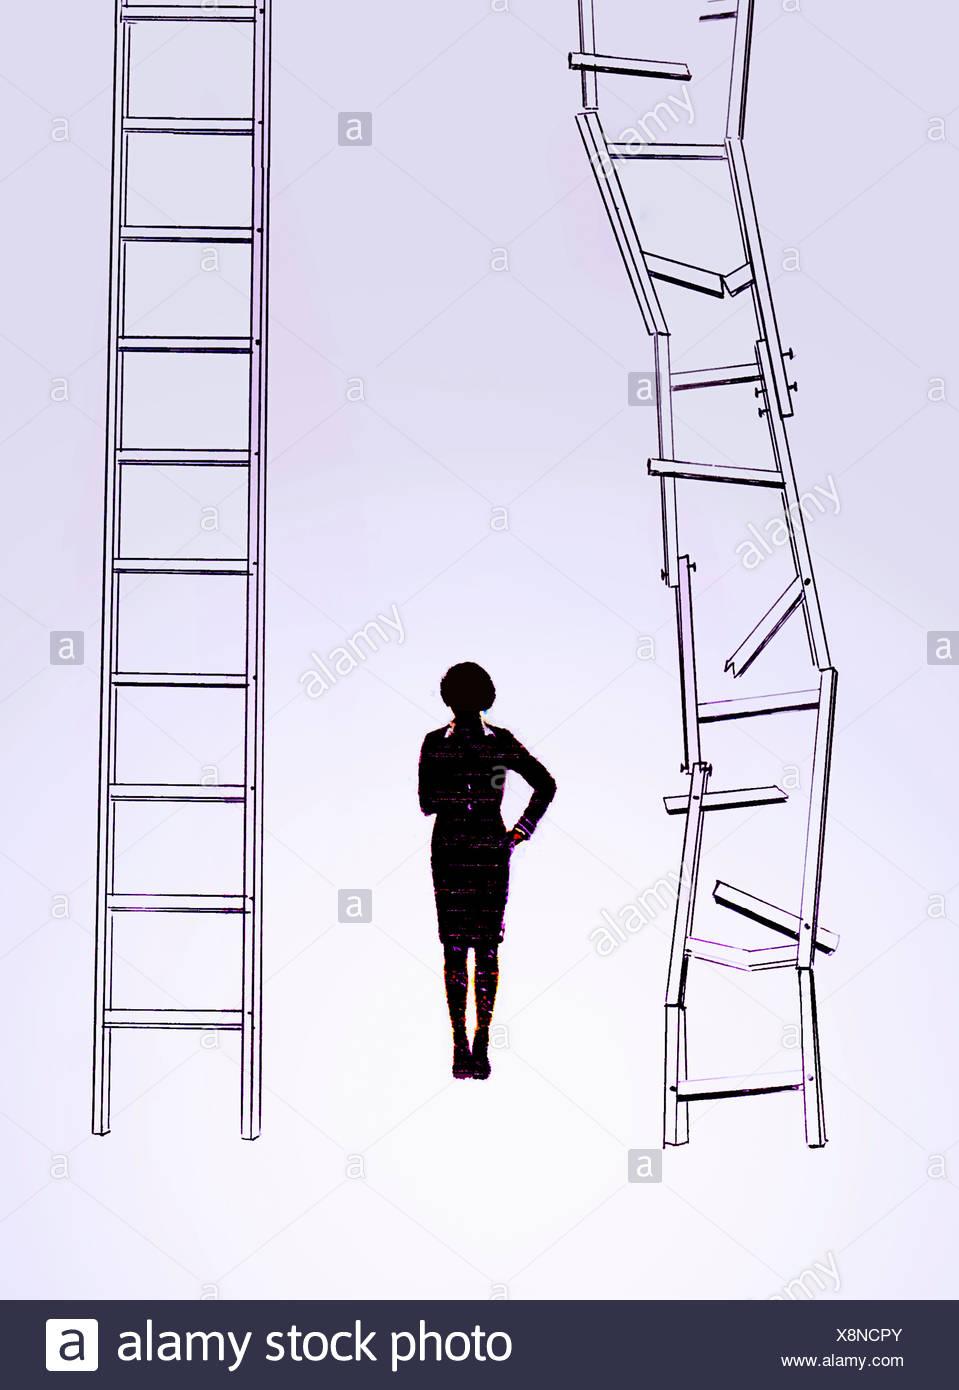 Businesswoman choosing career ladder - Stock Image